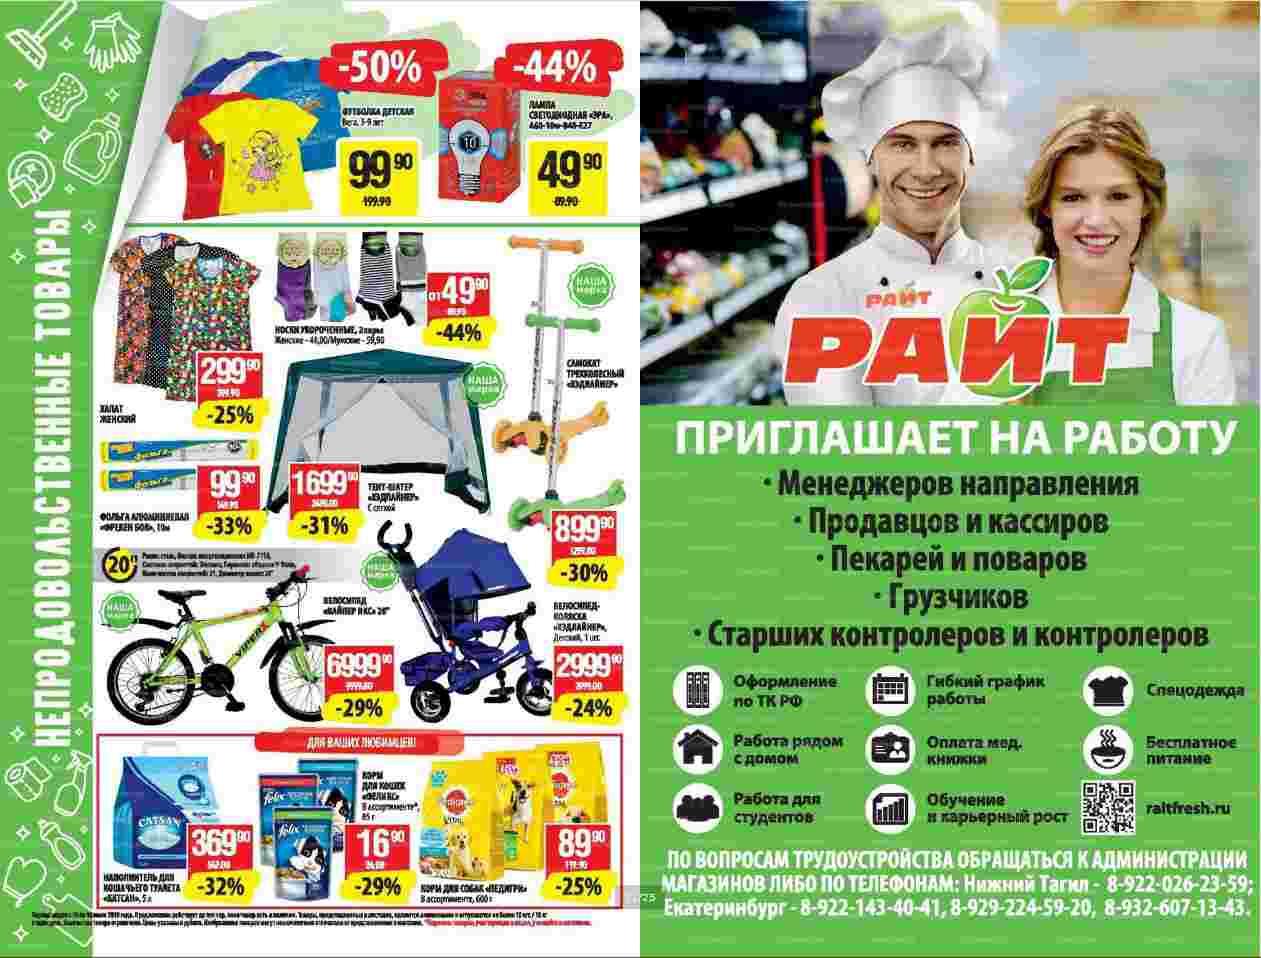 Каталог гипермаркетов РАЙТ 10-16.06.2019 стр.11